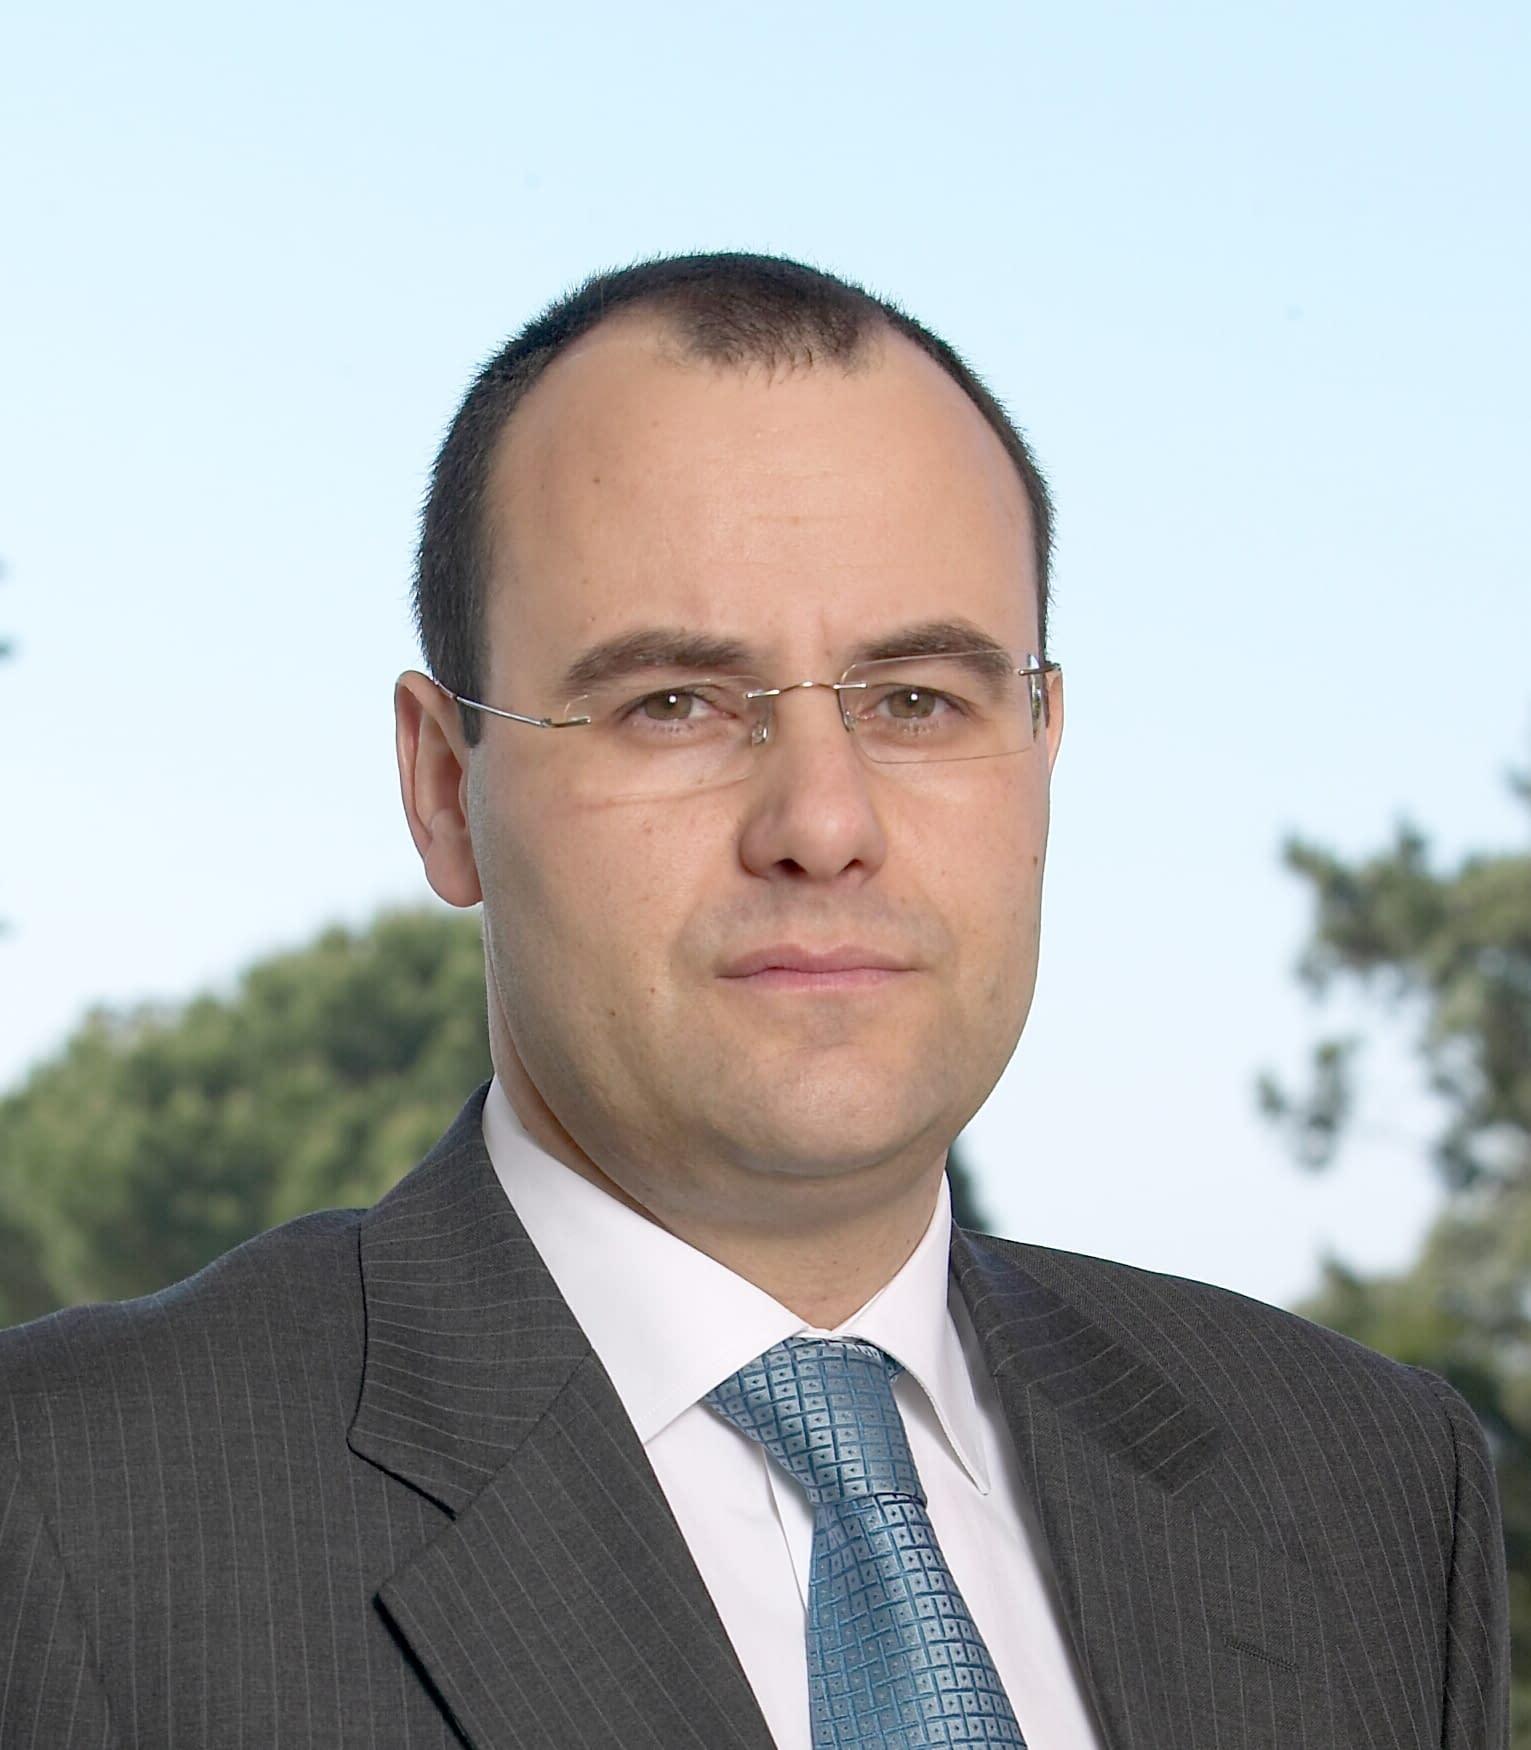 António Redondo